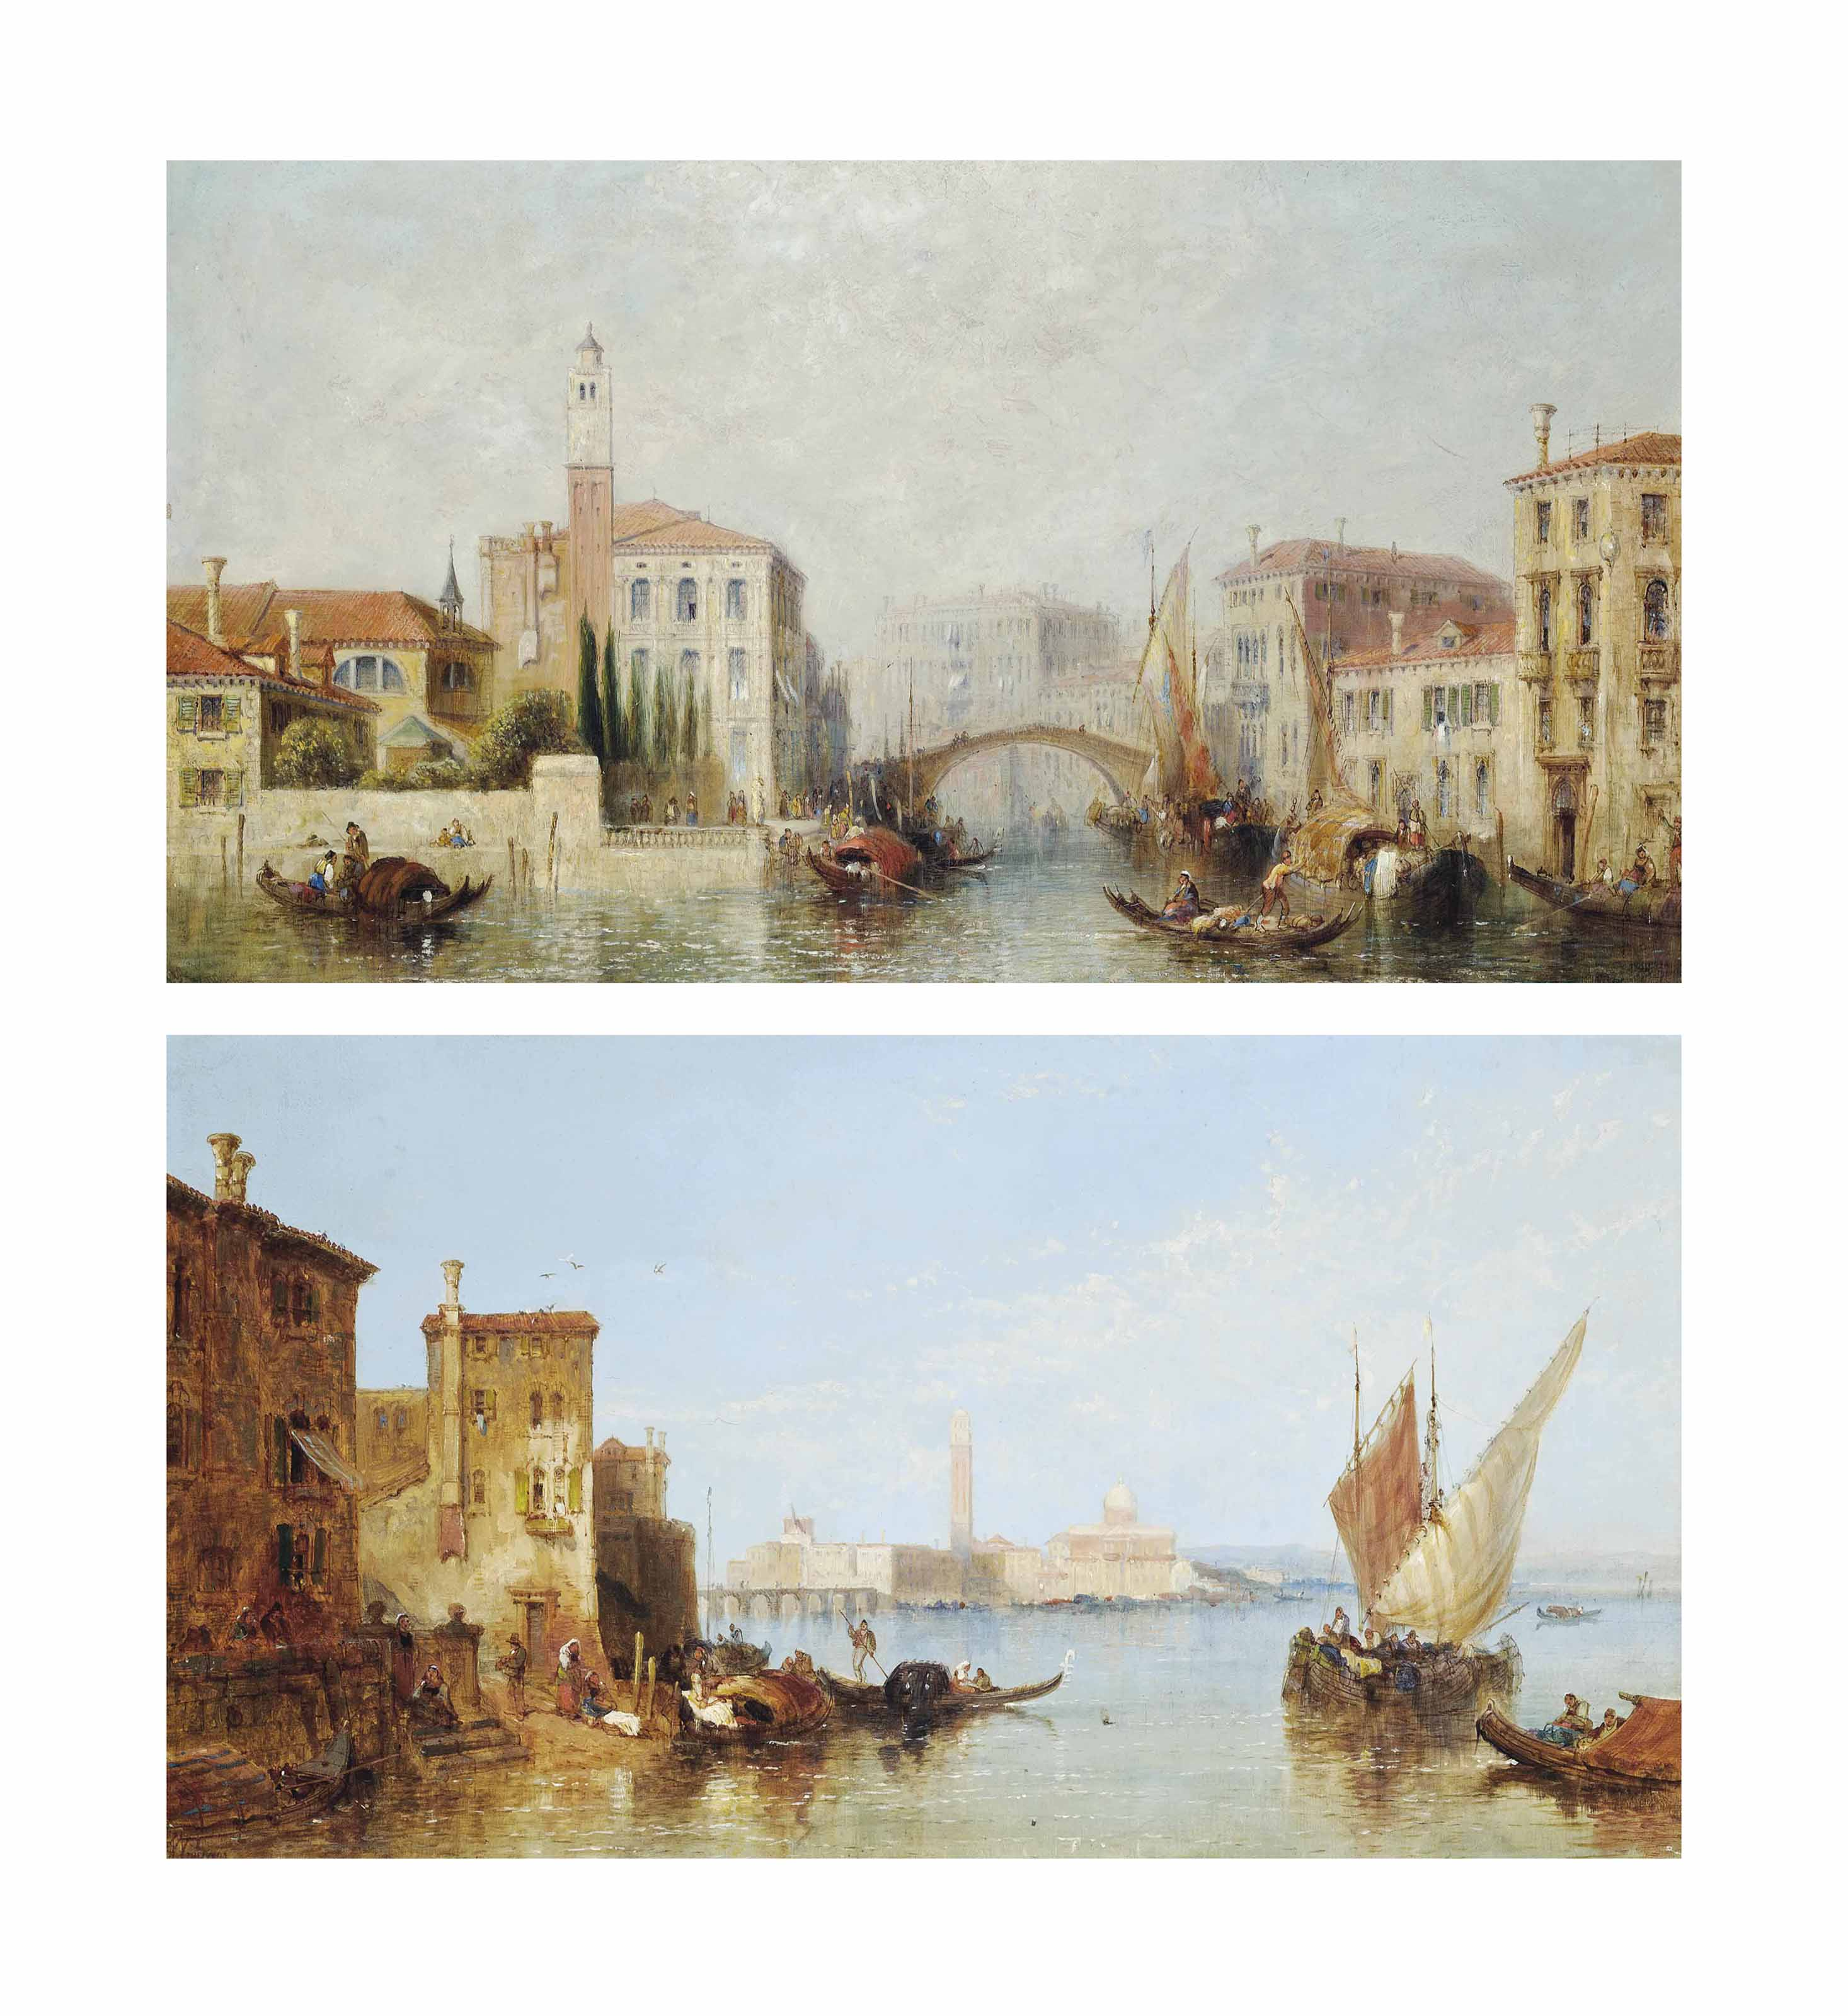 On Venetian waters, a capriccio; and On a Venetian canal, a capriccio